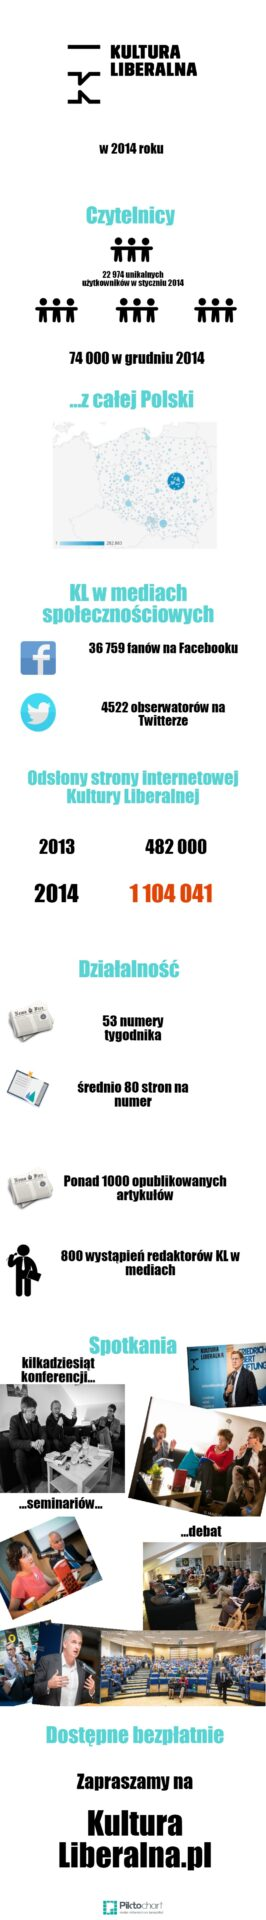 Kultura Liberalna 2014 infografika